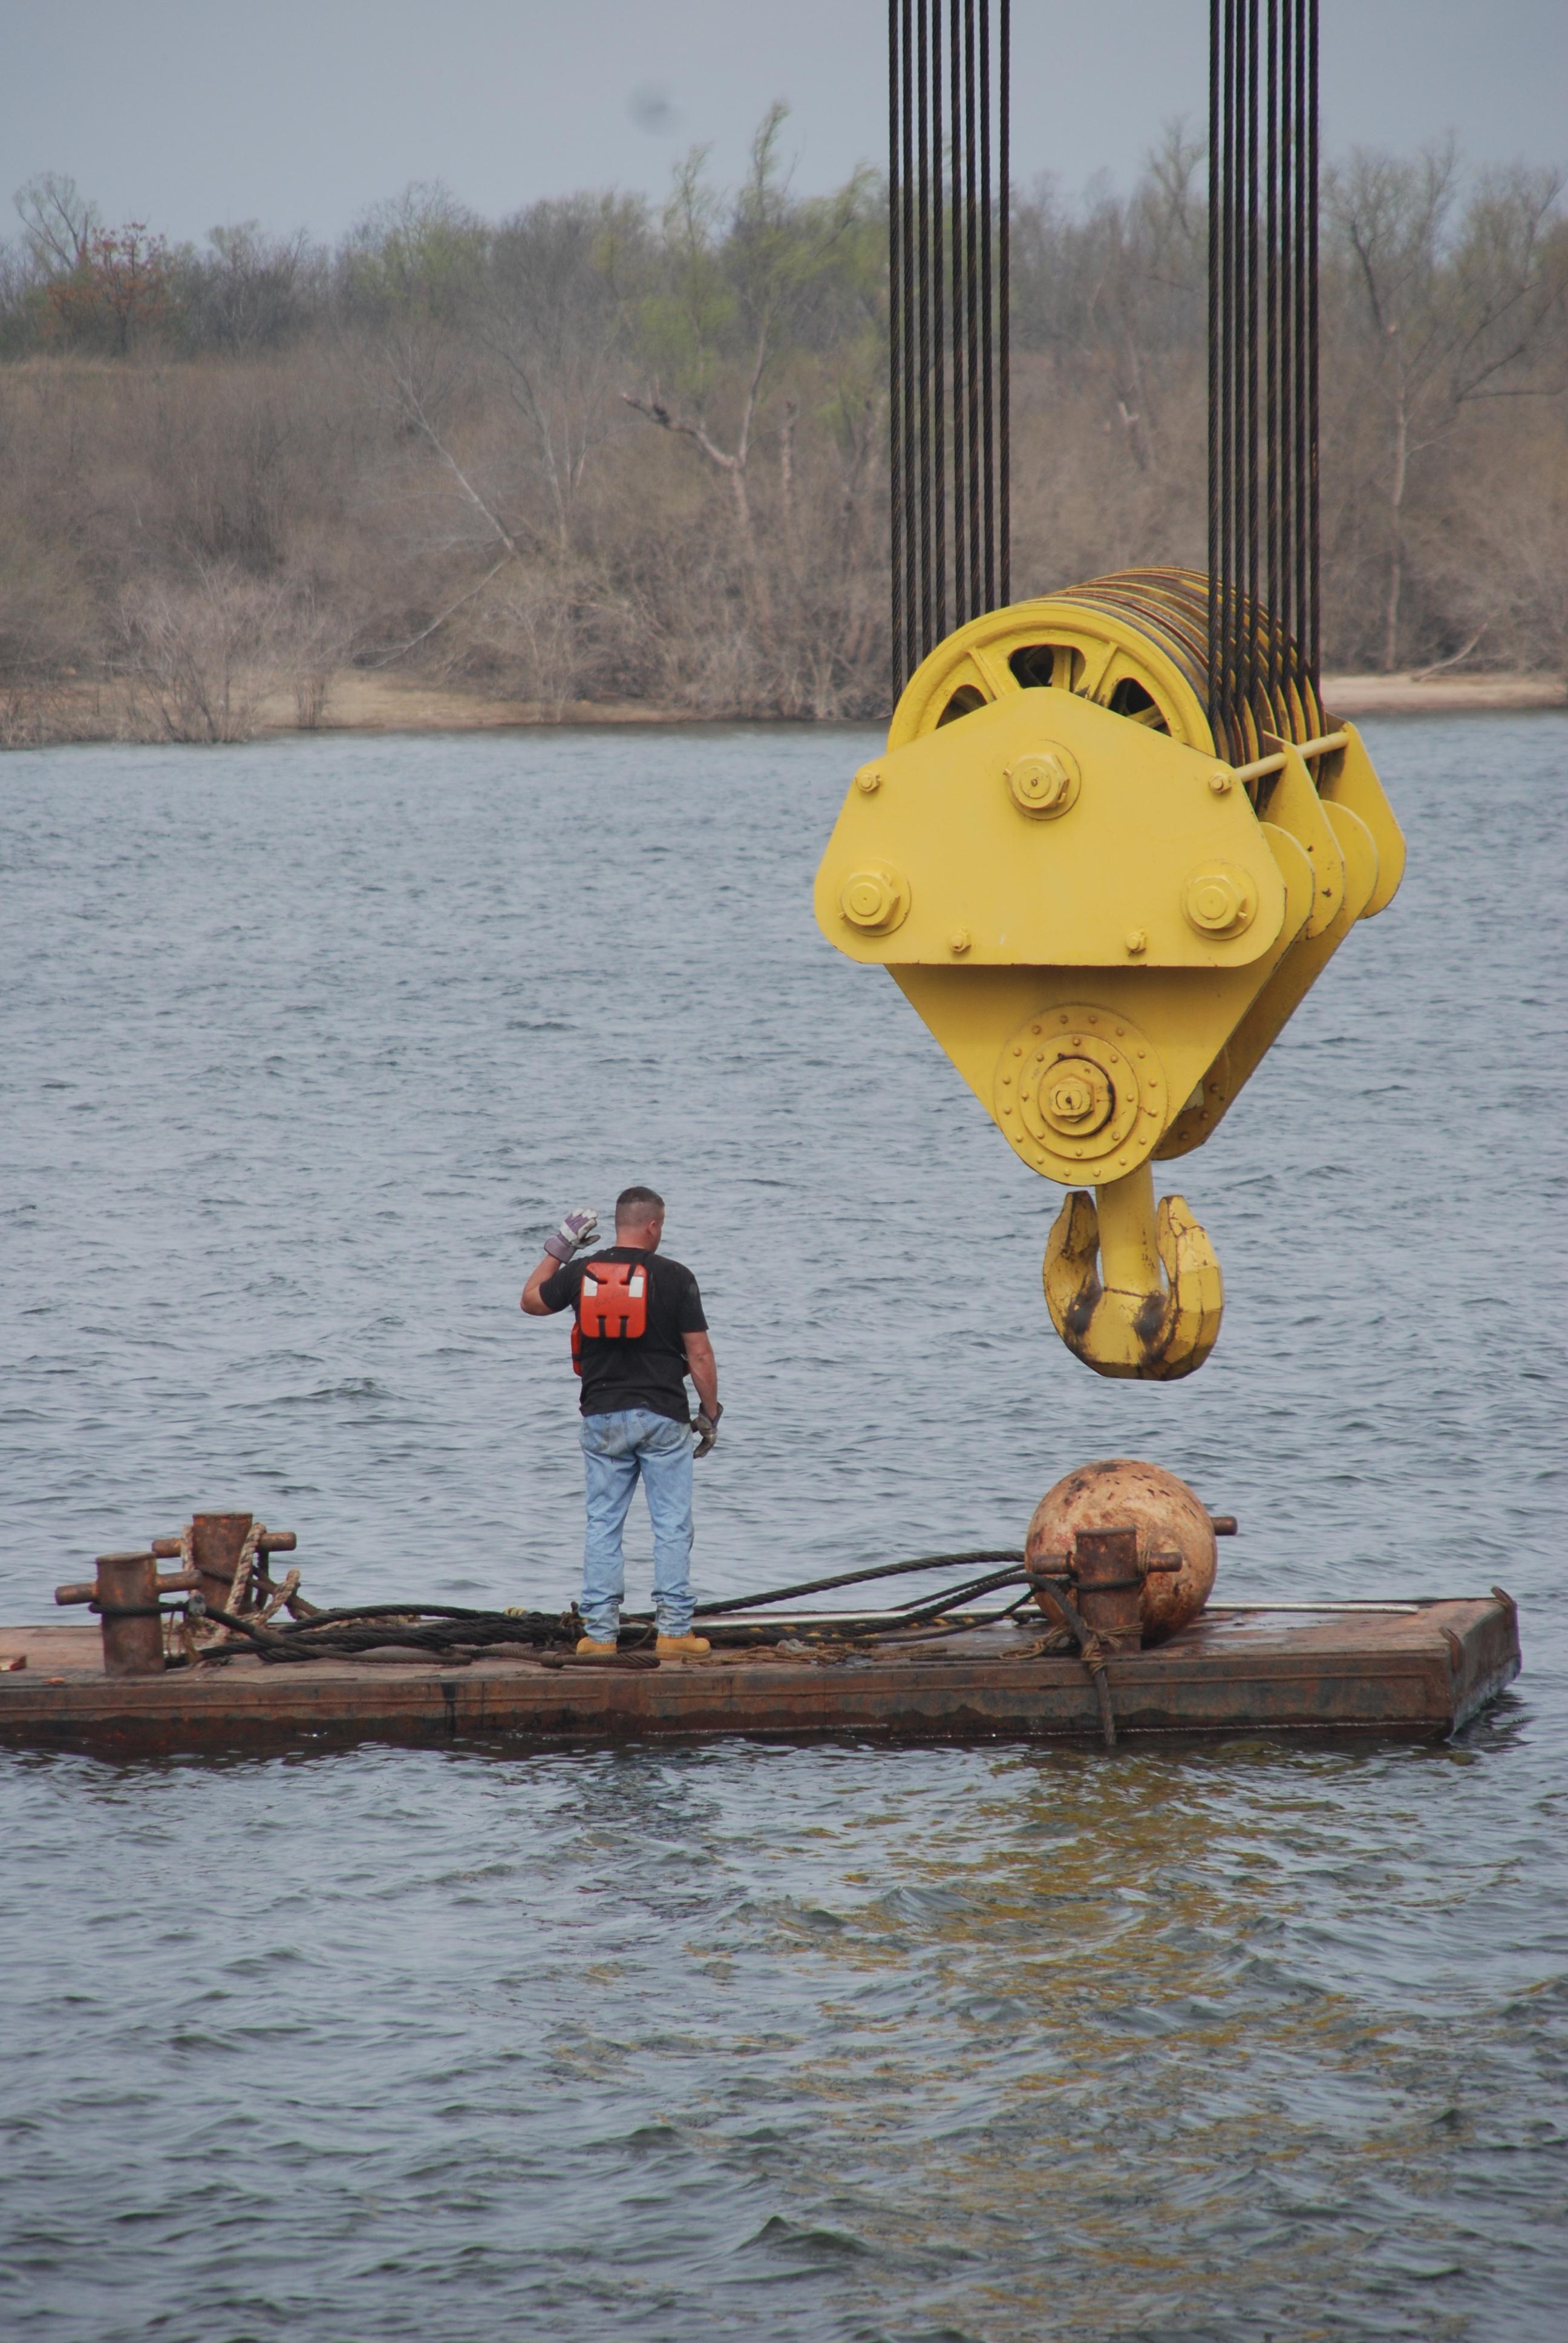 River Workers Injuries